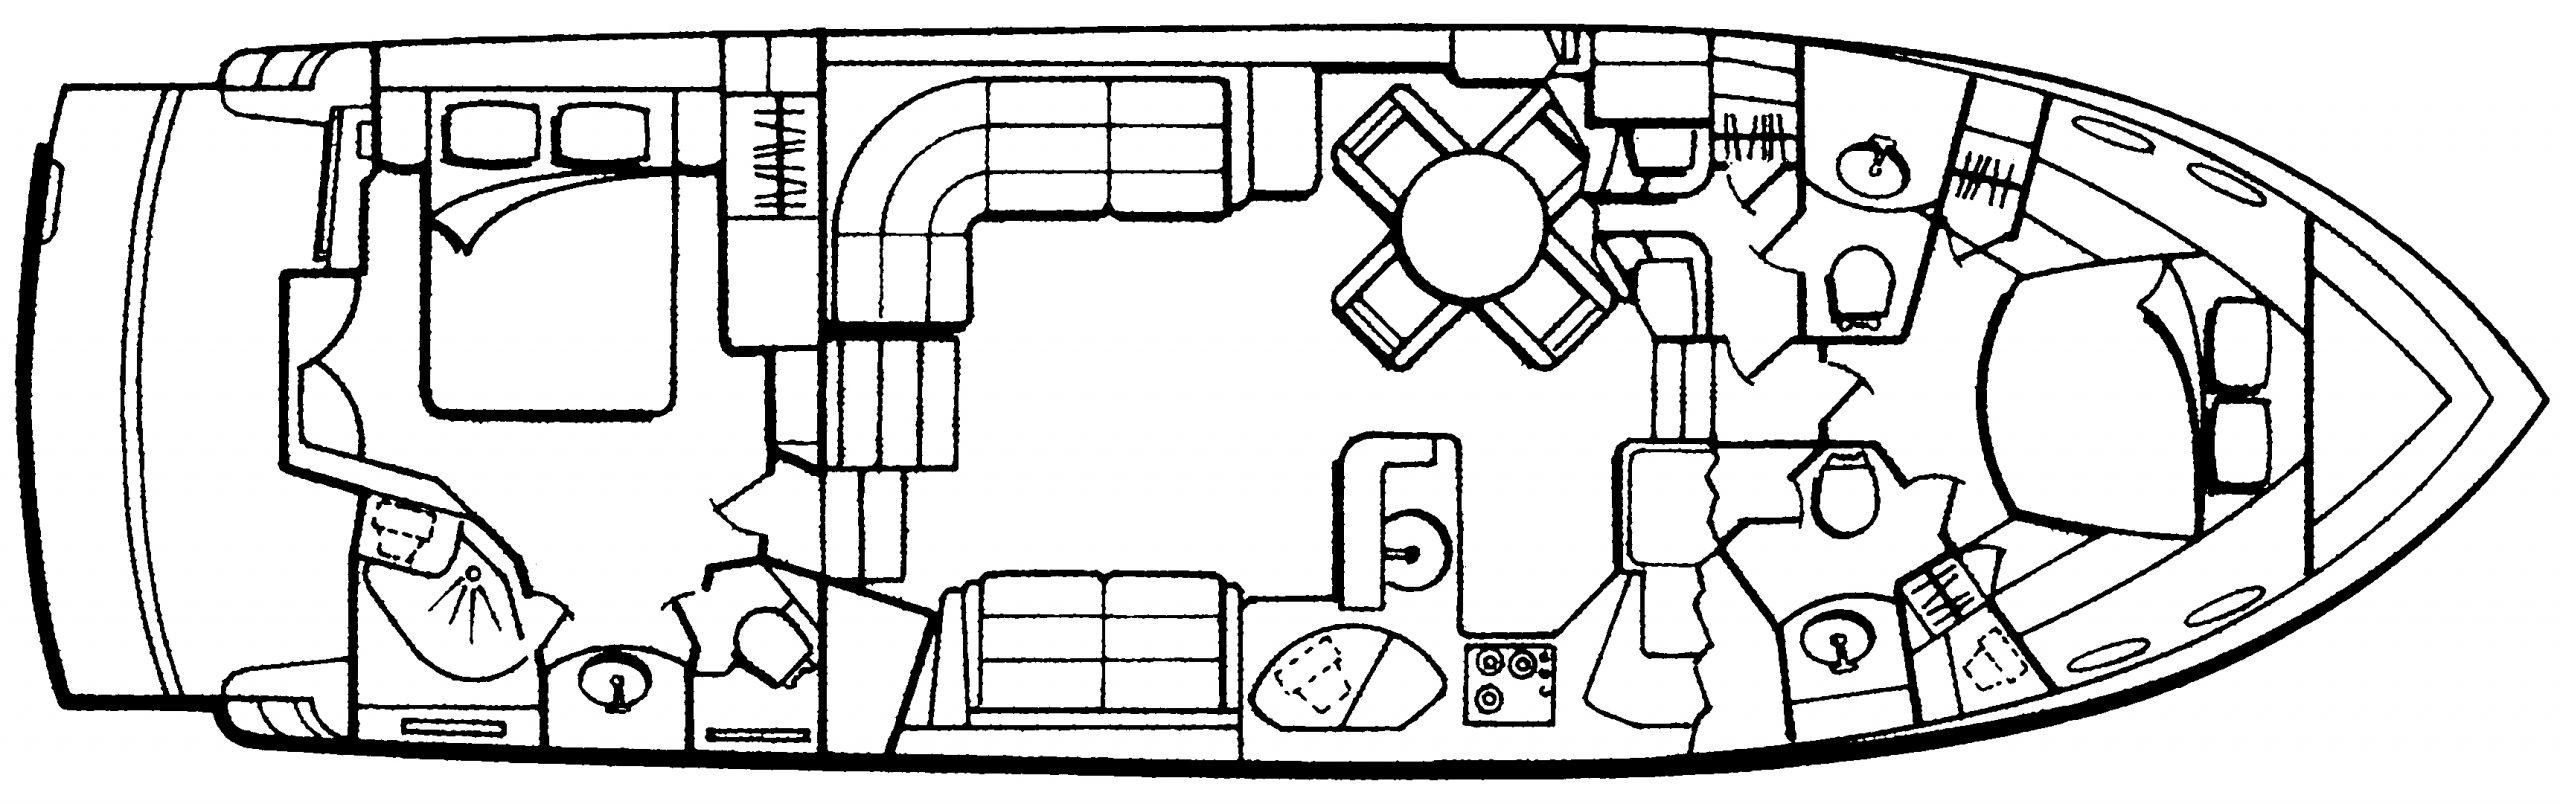 506 Motor Yacht Floor Plan 1